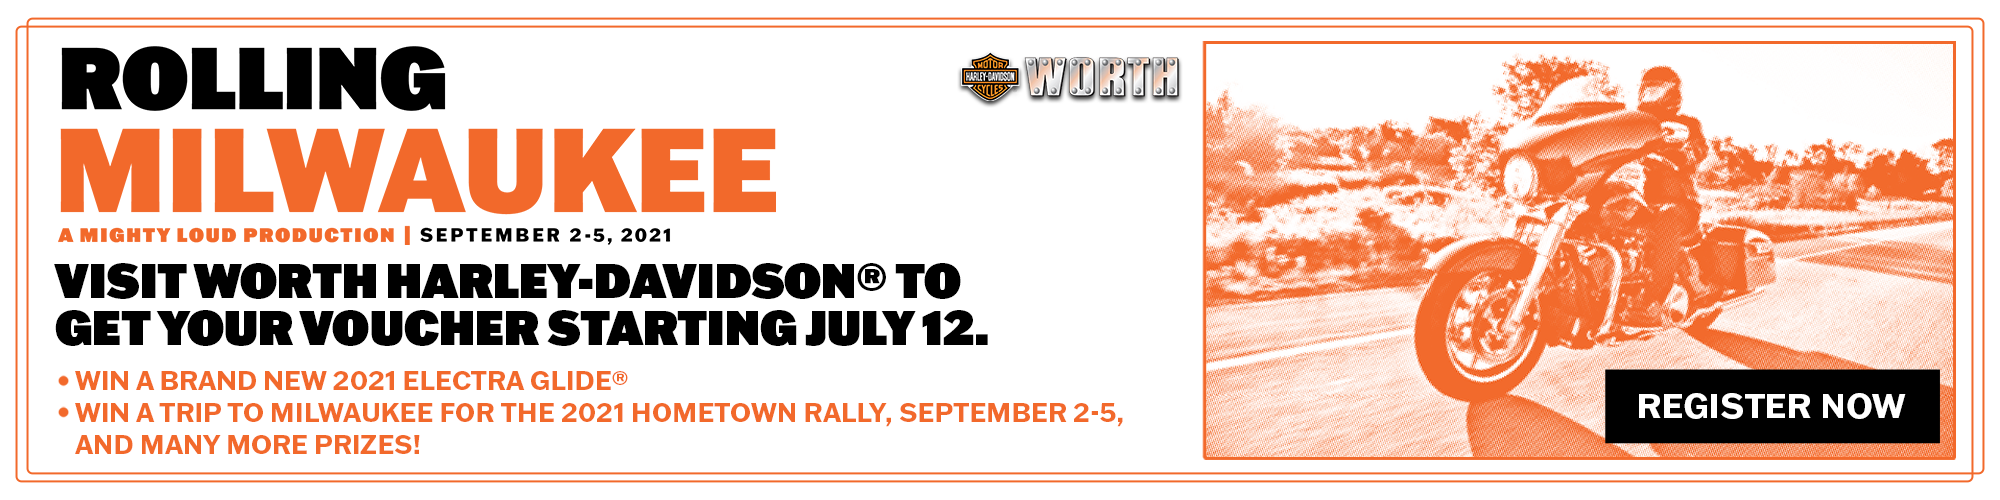 Worth Harley Davidson Rolling Milwaukee